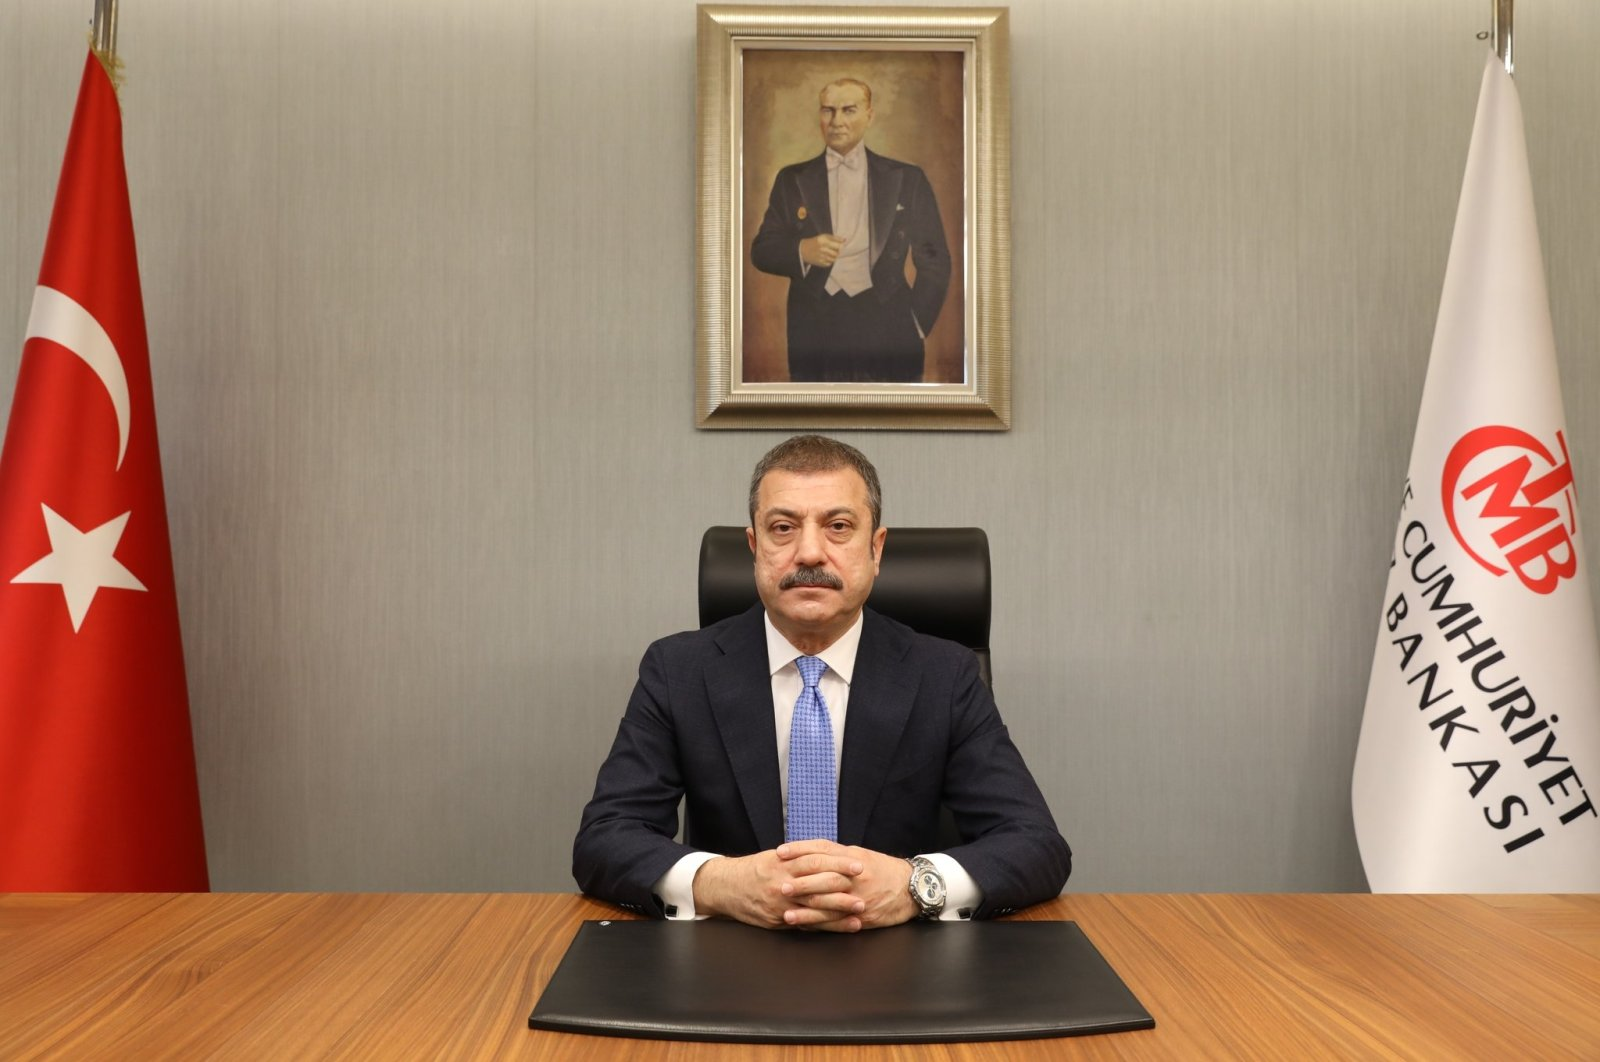 Newly appointed Central Bank of the Republic of Turkey (CBRT) Governor Şahap Kavcıoğlu, Ankara, Turkey, March 21, 2021. (DHA Photo)